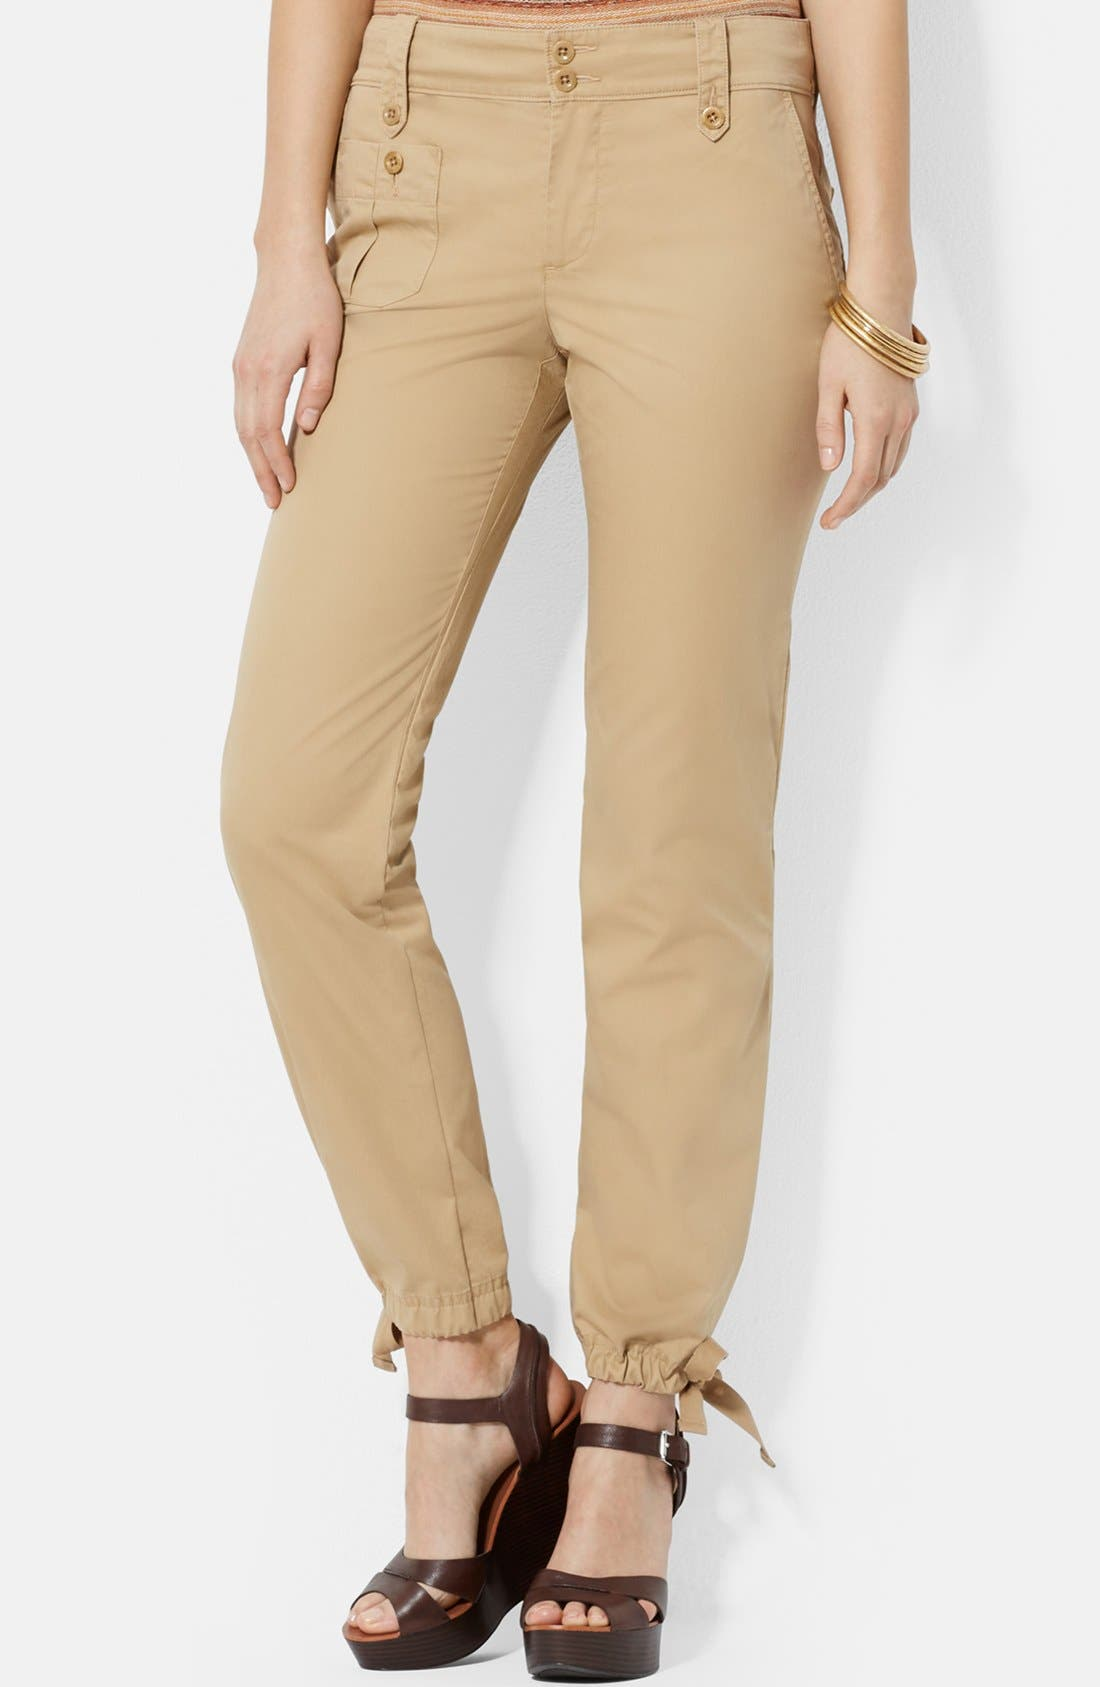 Cotton Drawstring Ankle Cargo Pants, Main, color, 265